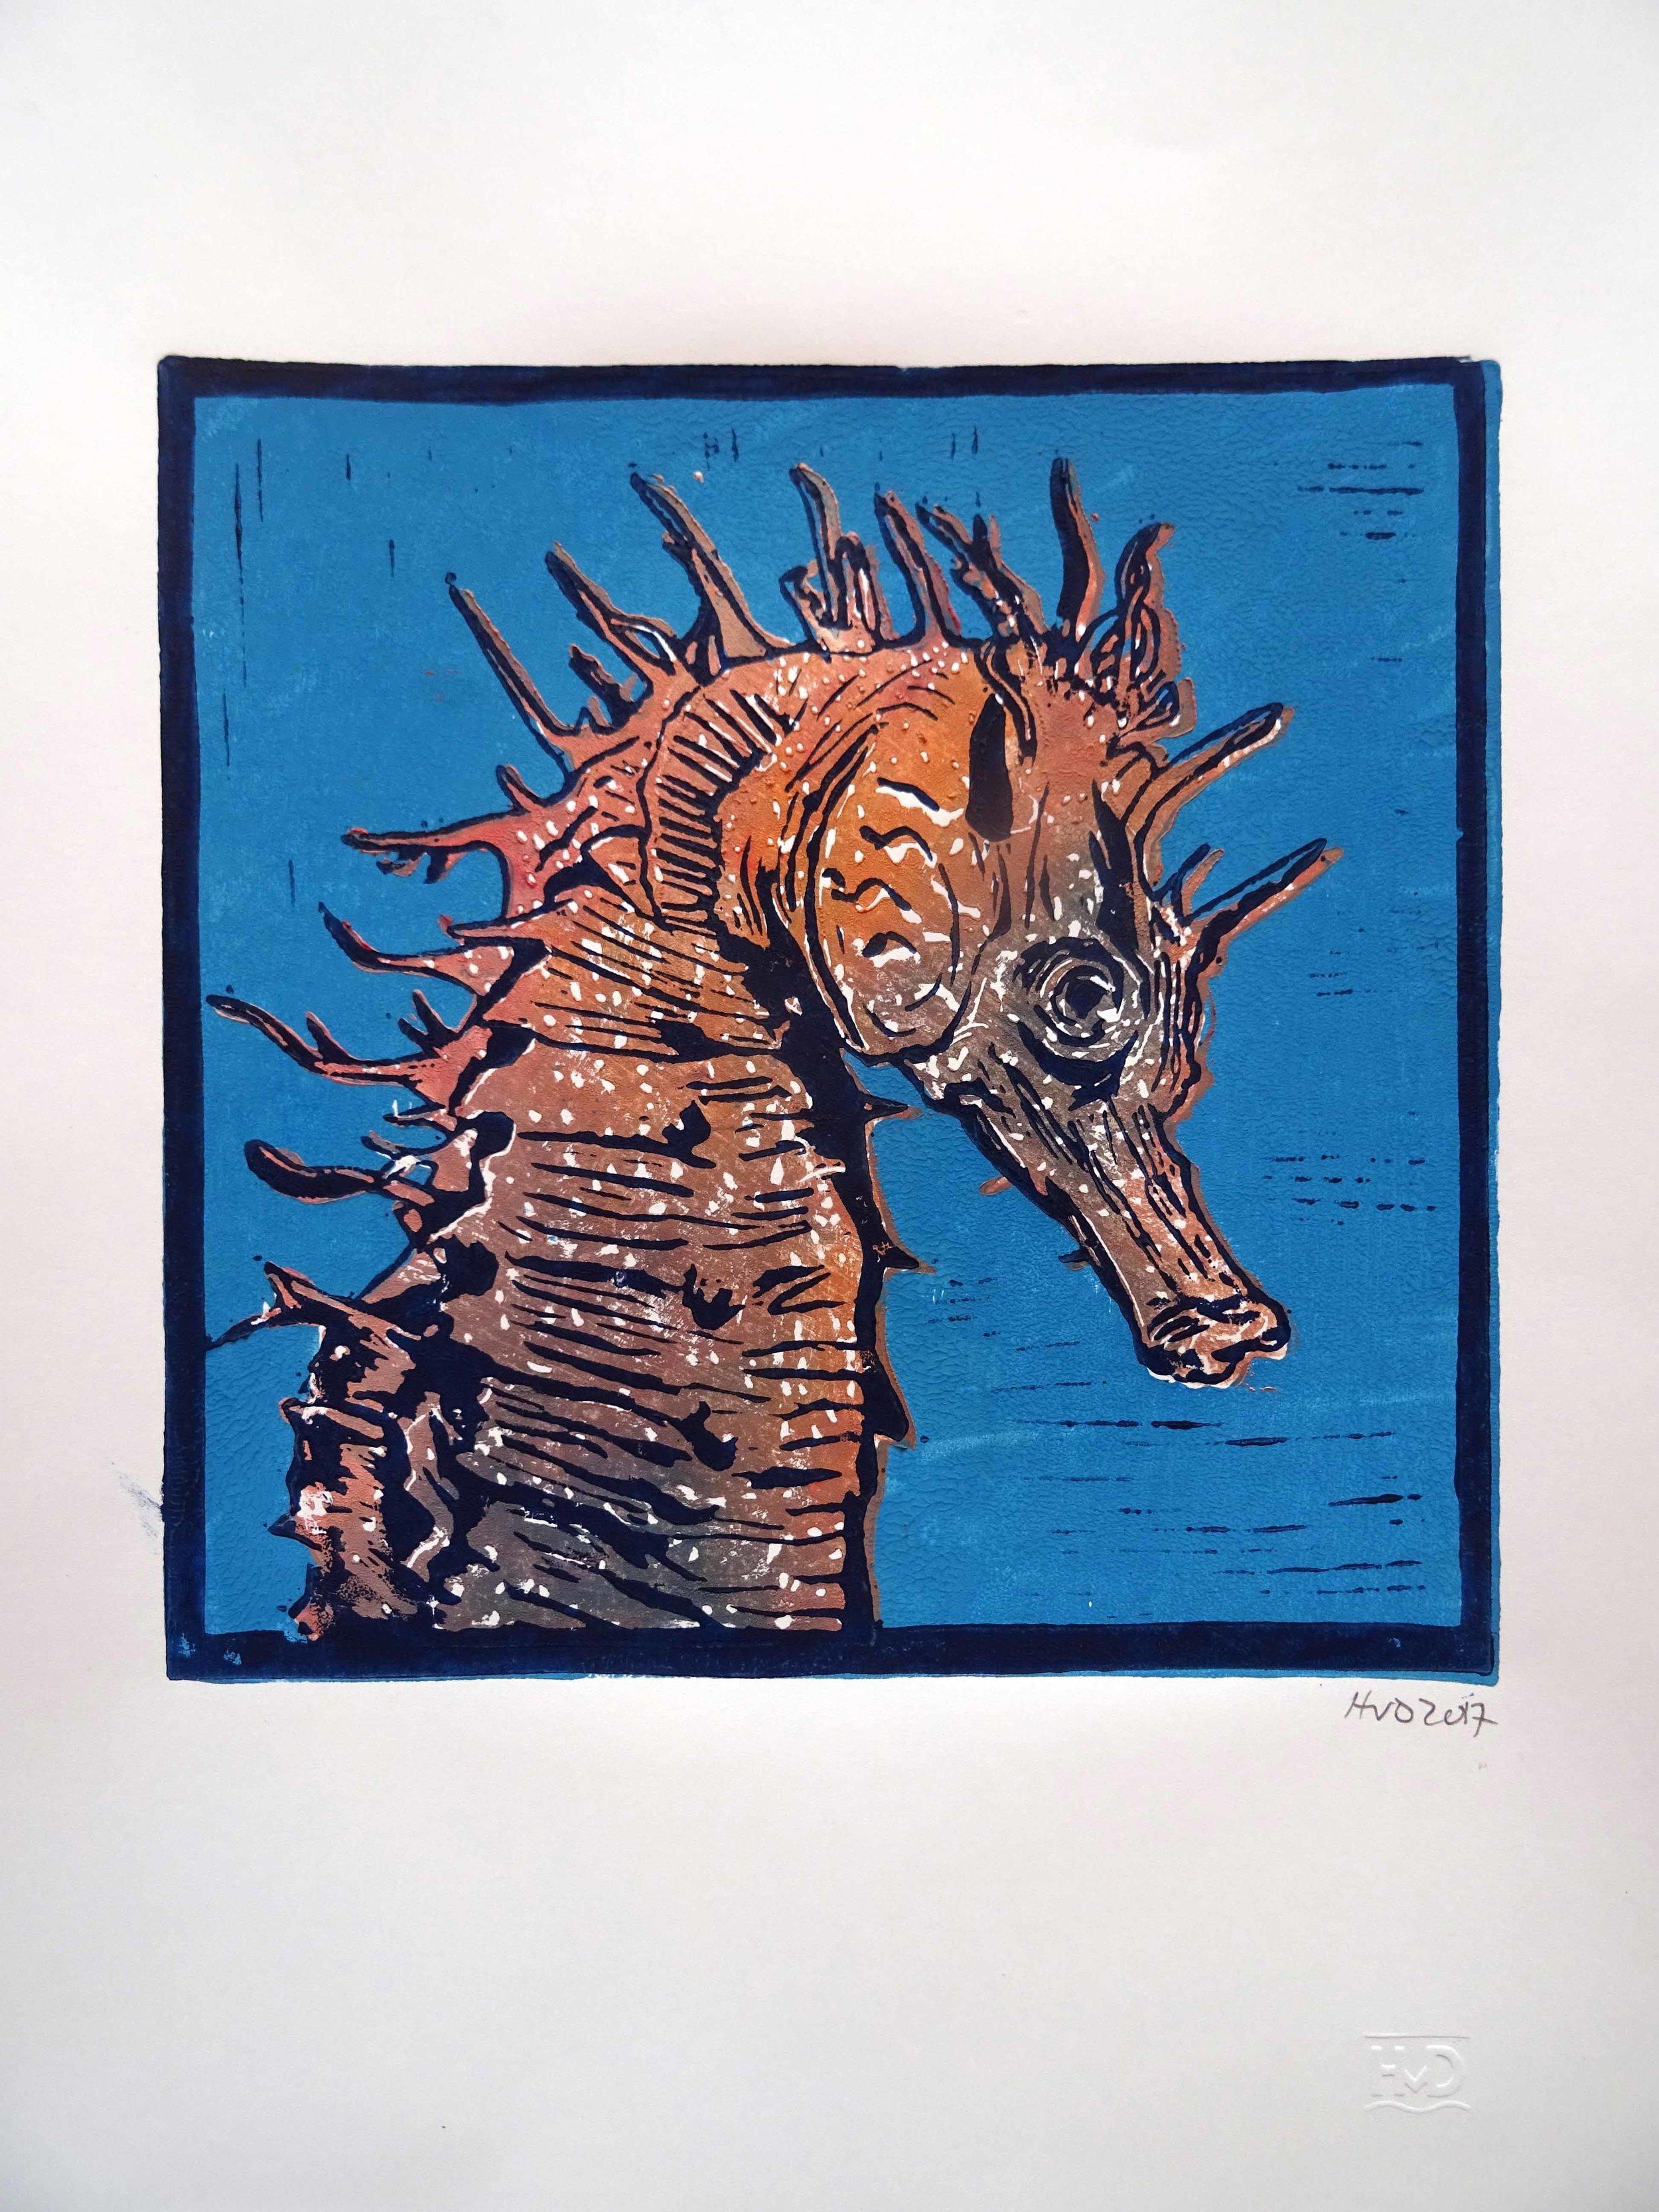 170-1, hippocampe 1, 21x21 cm, 3-plate lino. 80 €